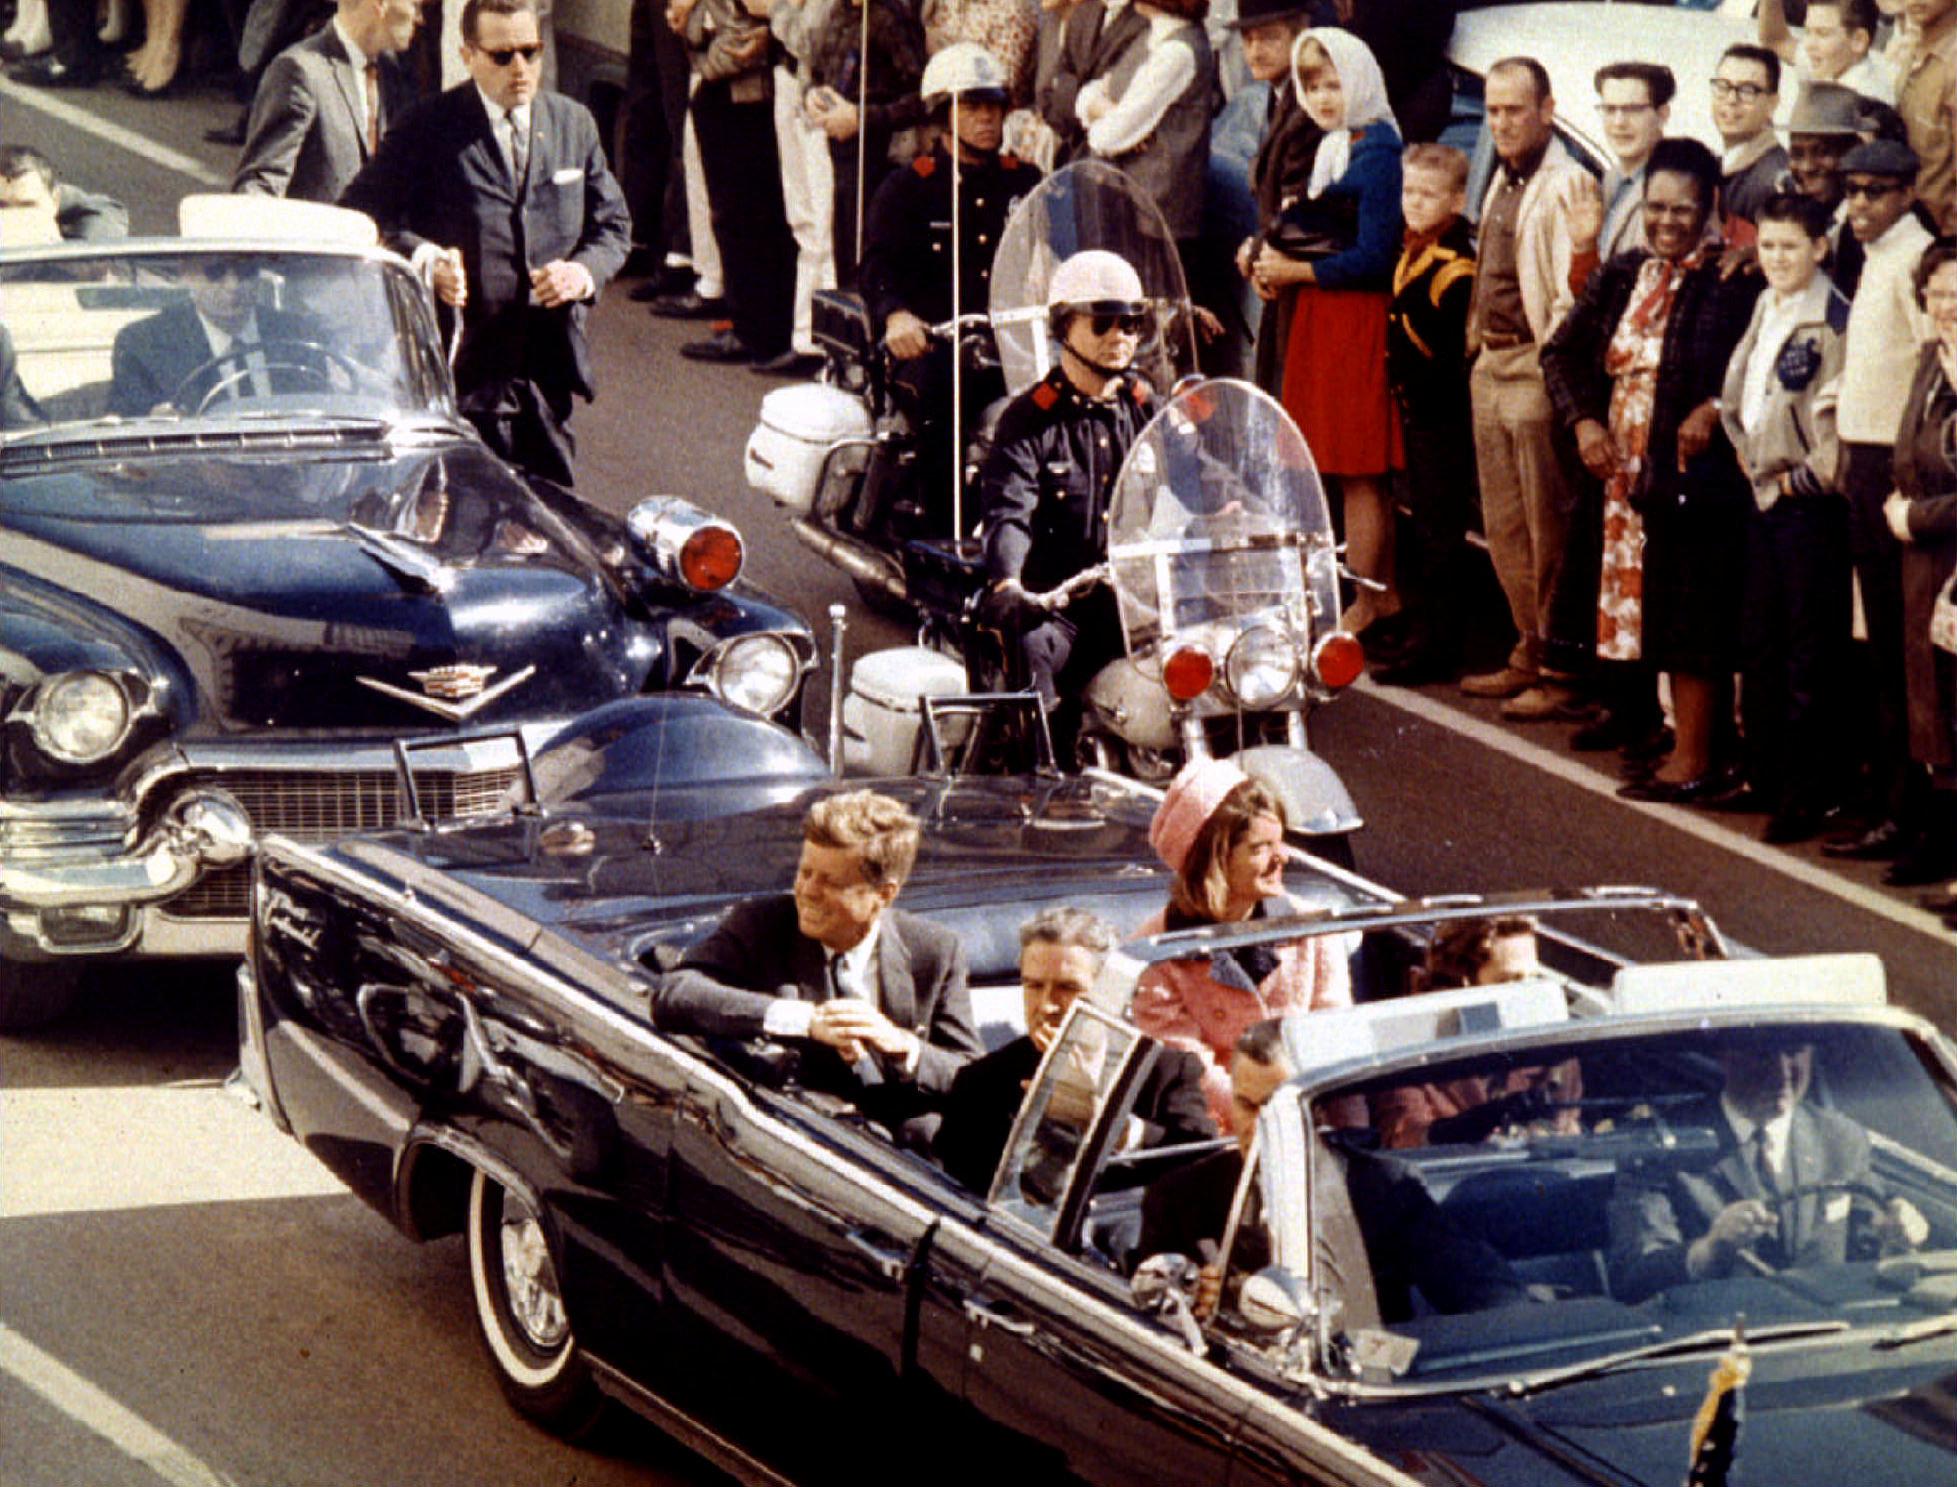 Trump releases some JFK files, blocks others under pressure